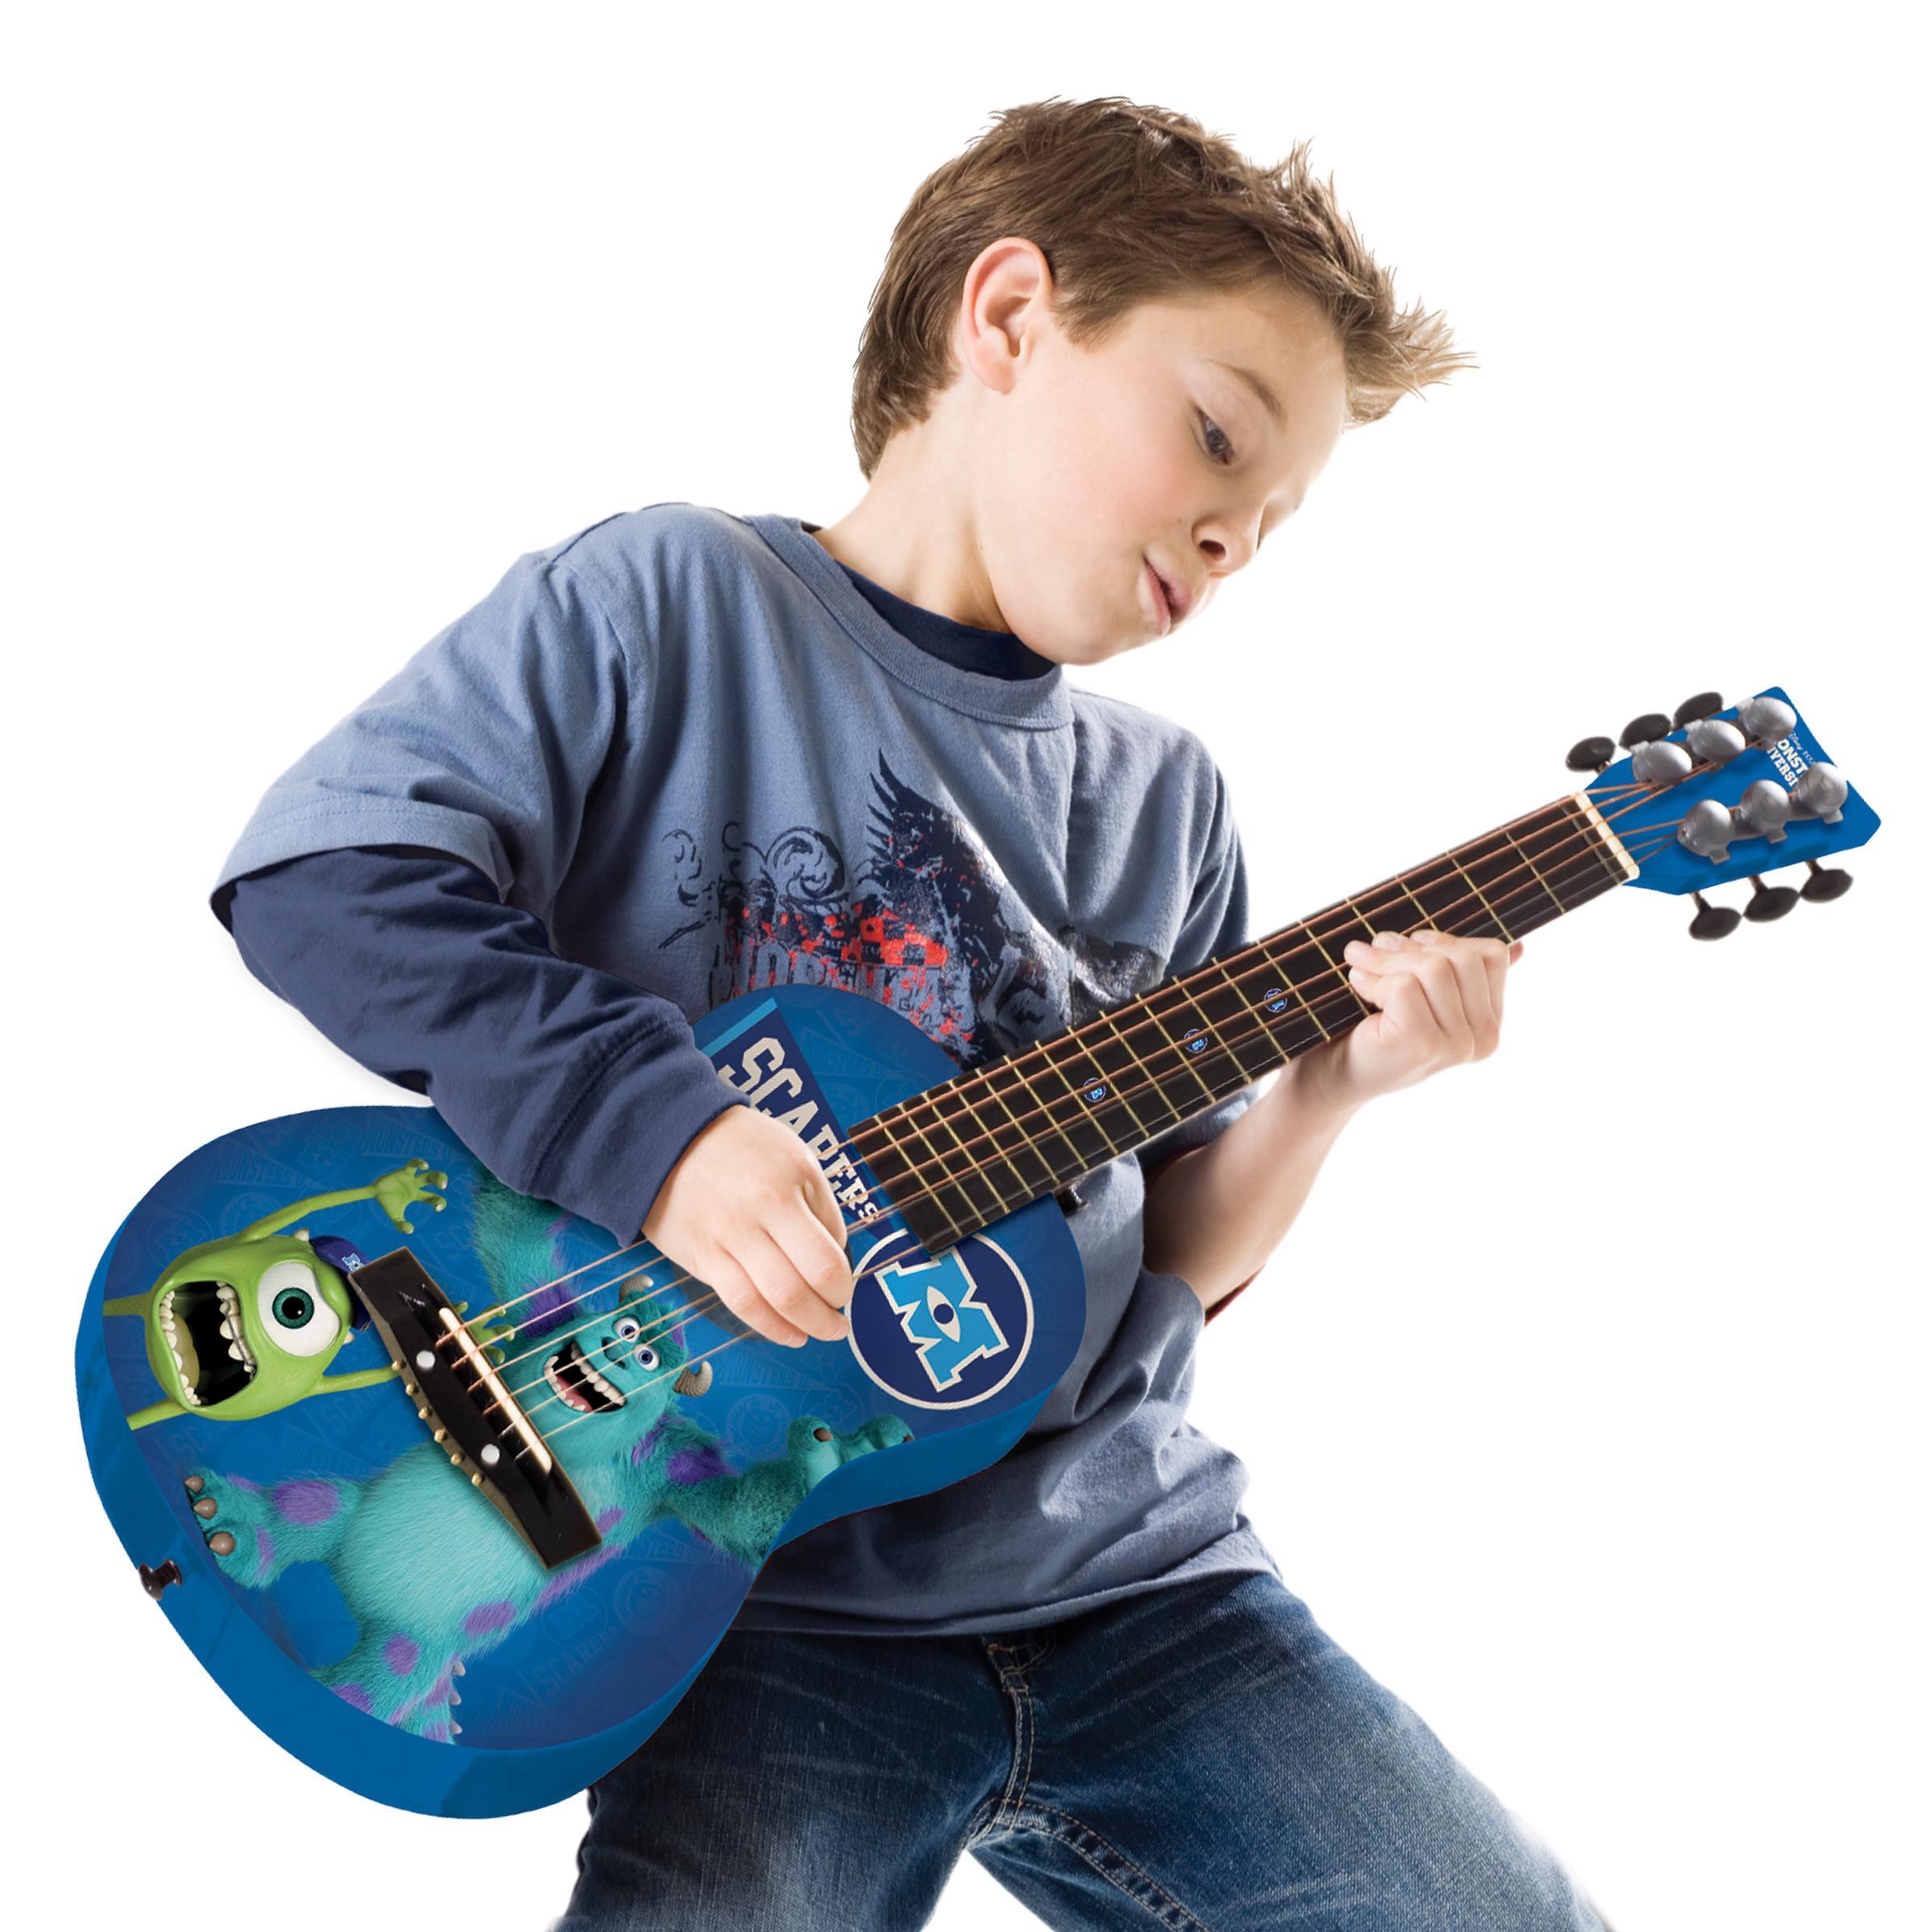 disney monsters first act acoustic guitar kids children play music instruments n ebay. Black Bedroom Furniture Sets. Home Design Ideas